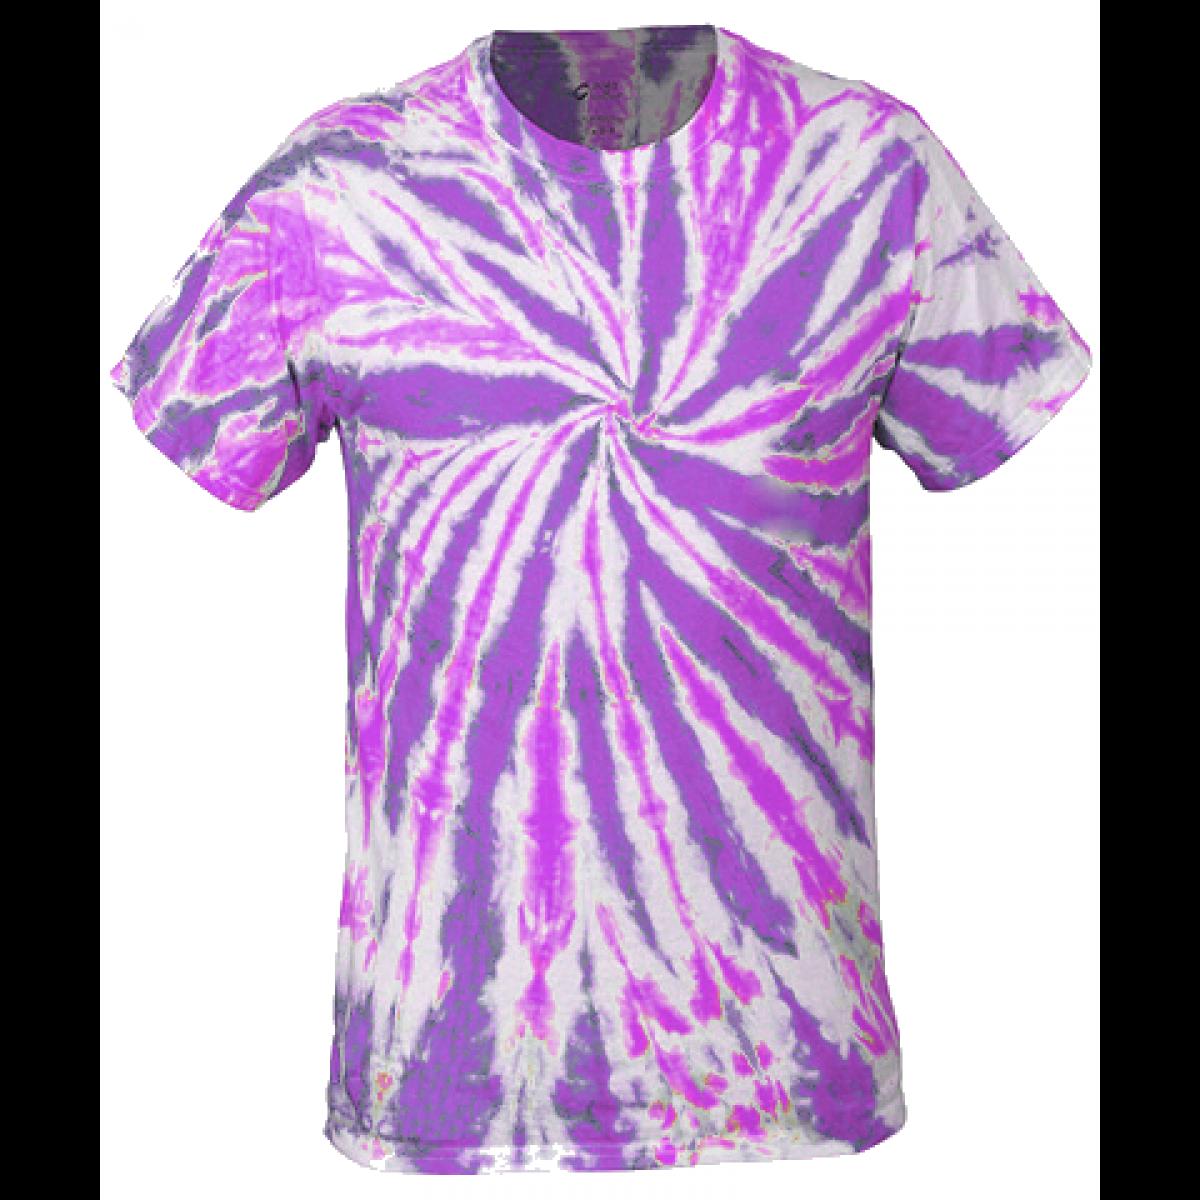 Multi-Color Tie-Dye Tee -Purple-L